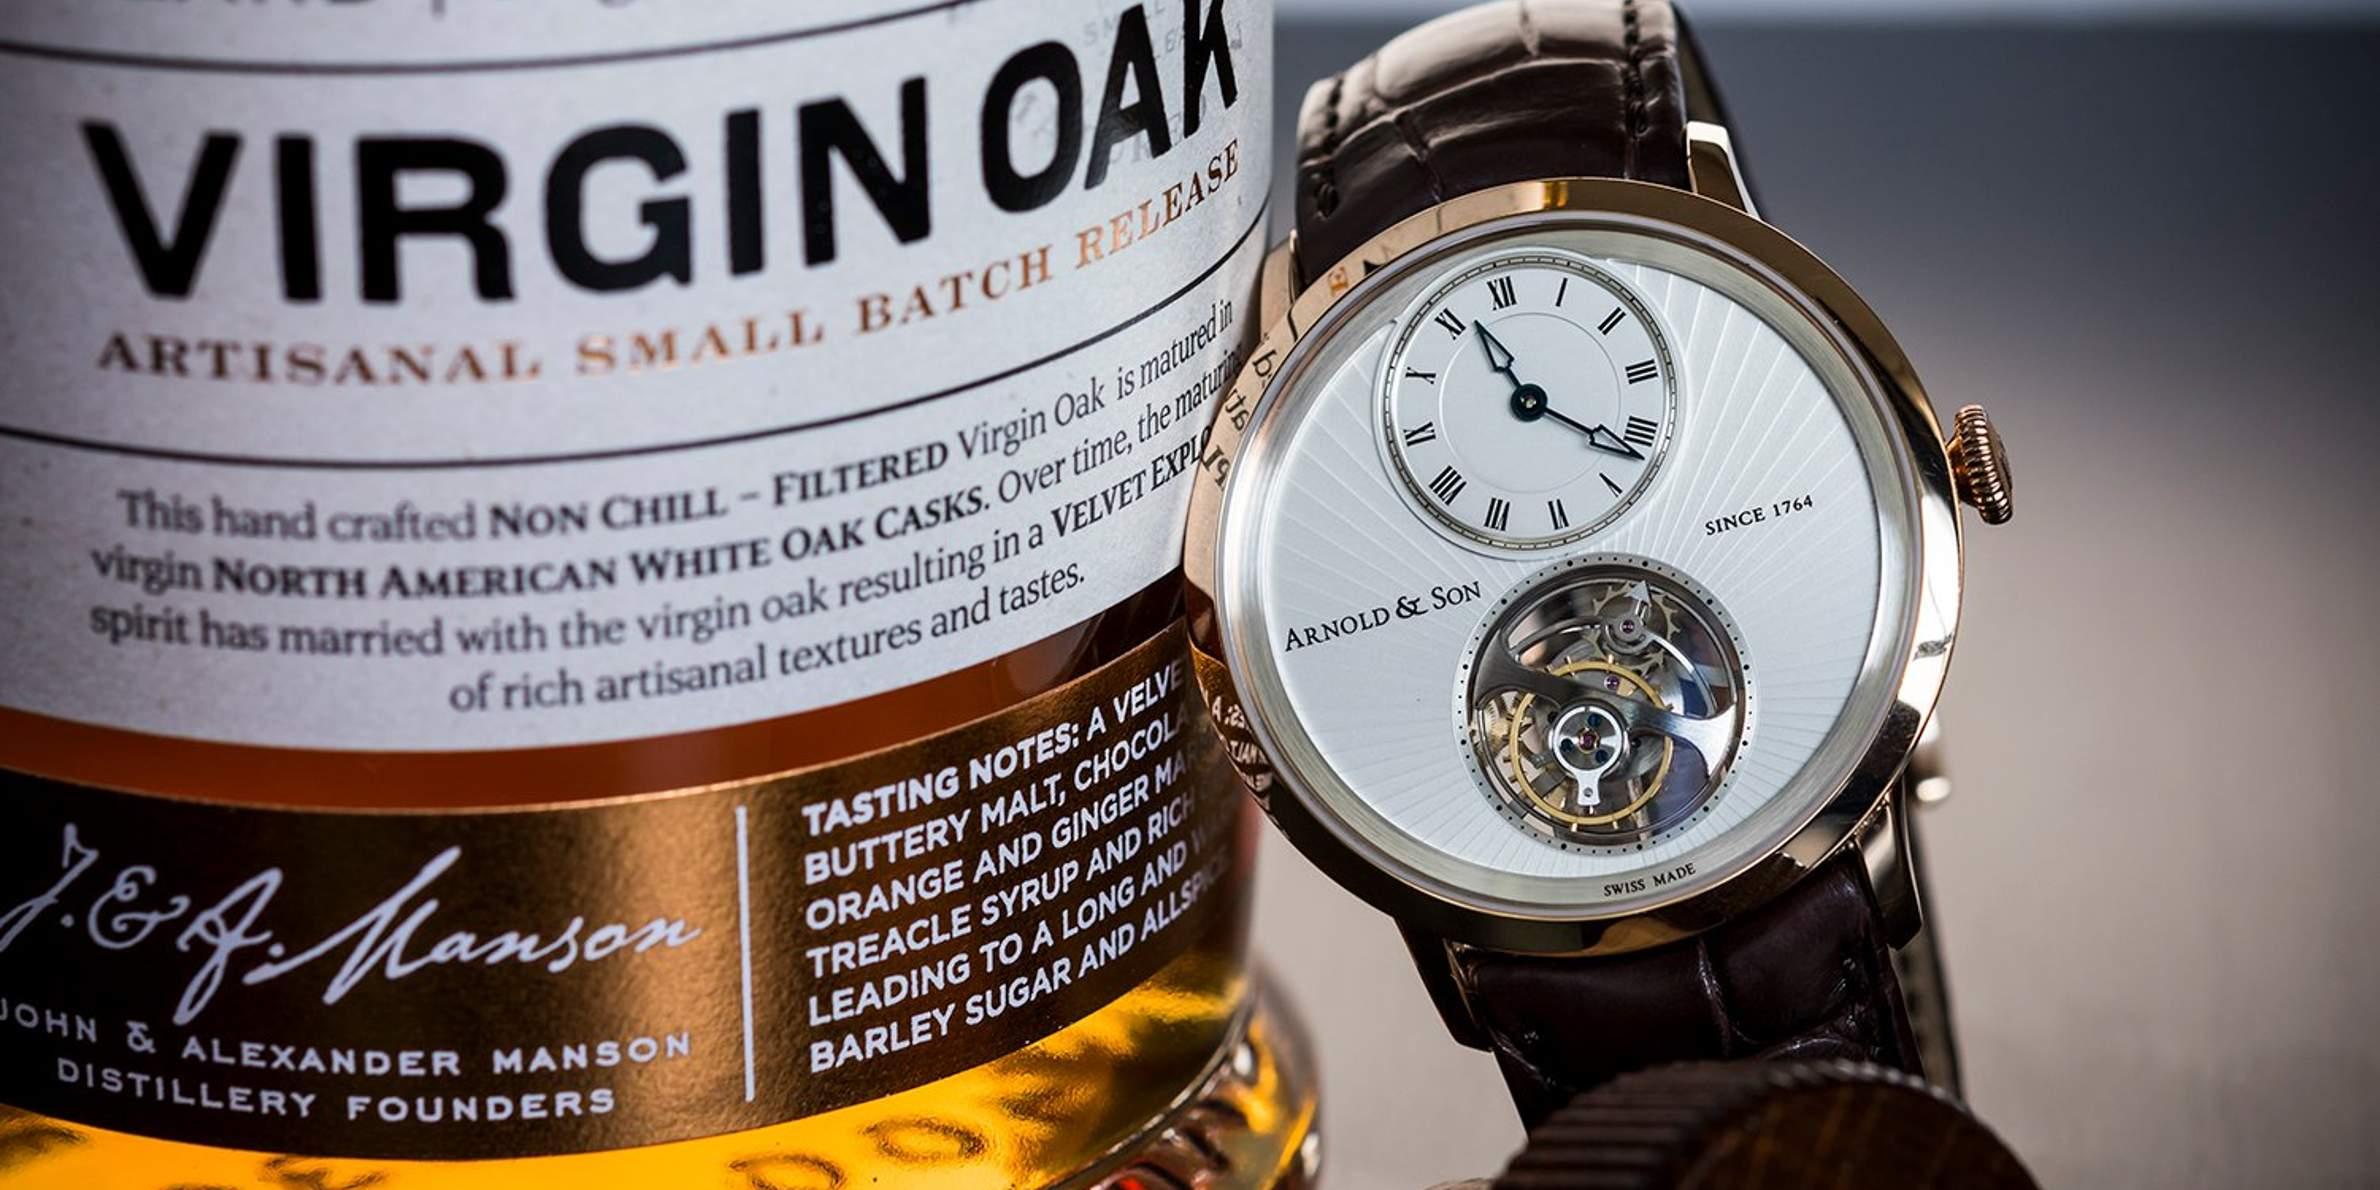 Arnold & Son Tourbillon with Single Malt Whisky